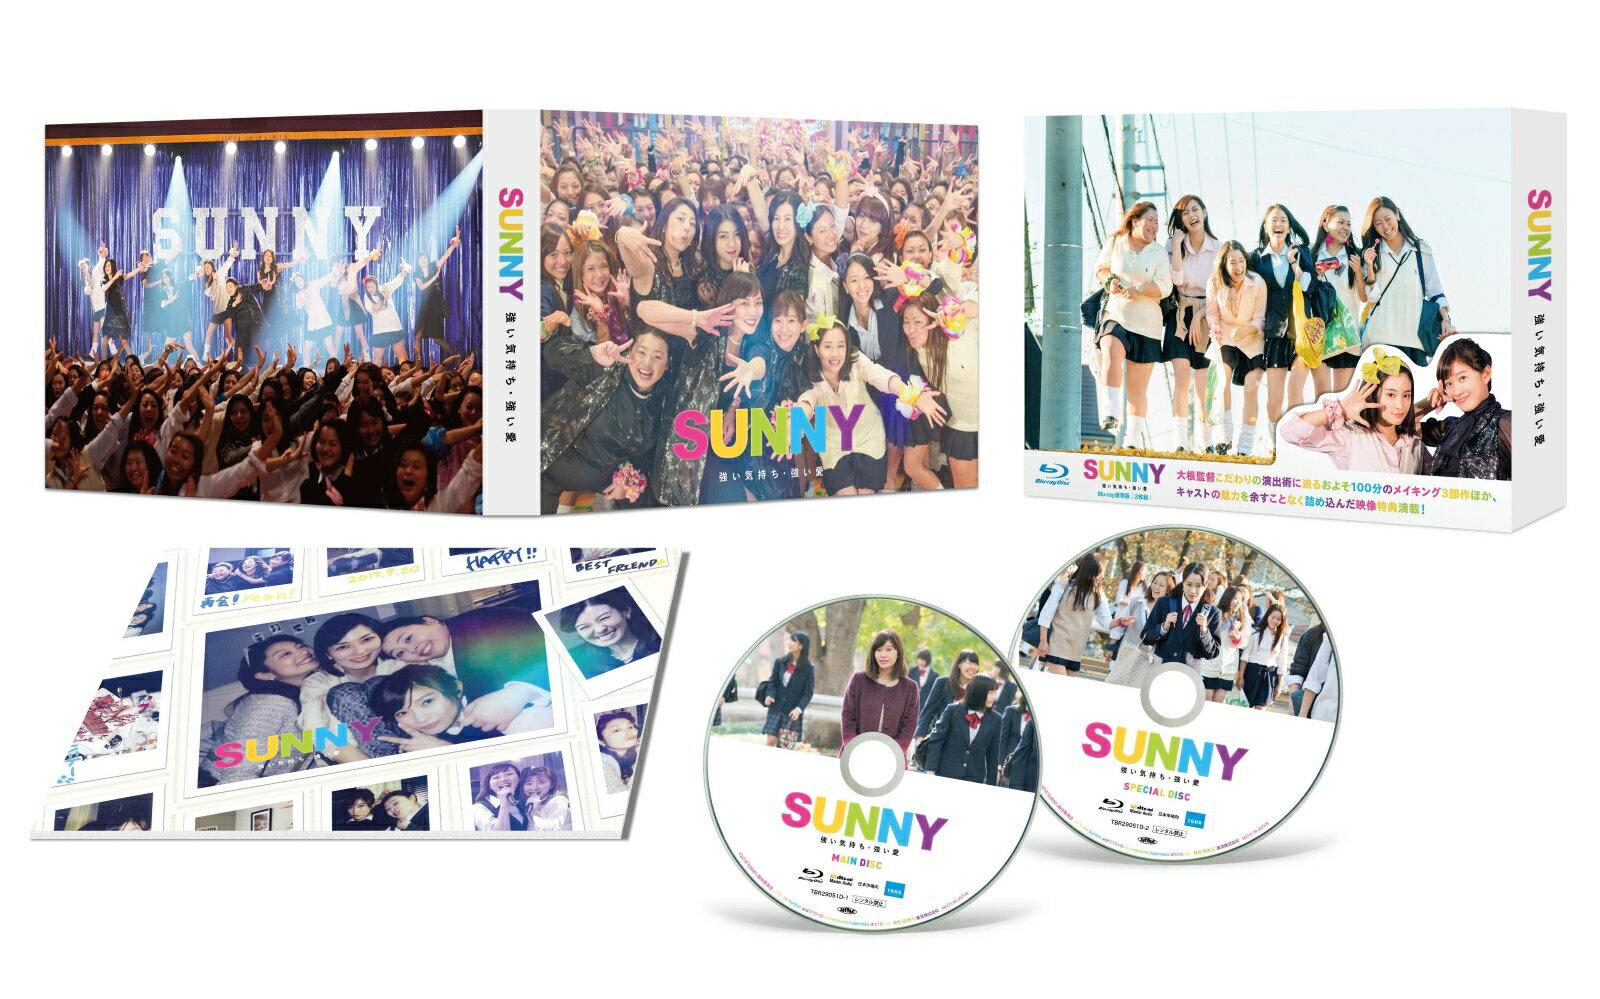 SUNNY 強い気持ち・強い愛 Blu-ray 豪華版【Blu-ray】 [ 篠原涼子 ]